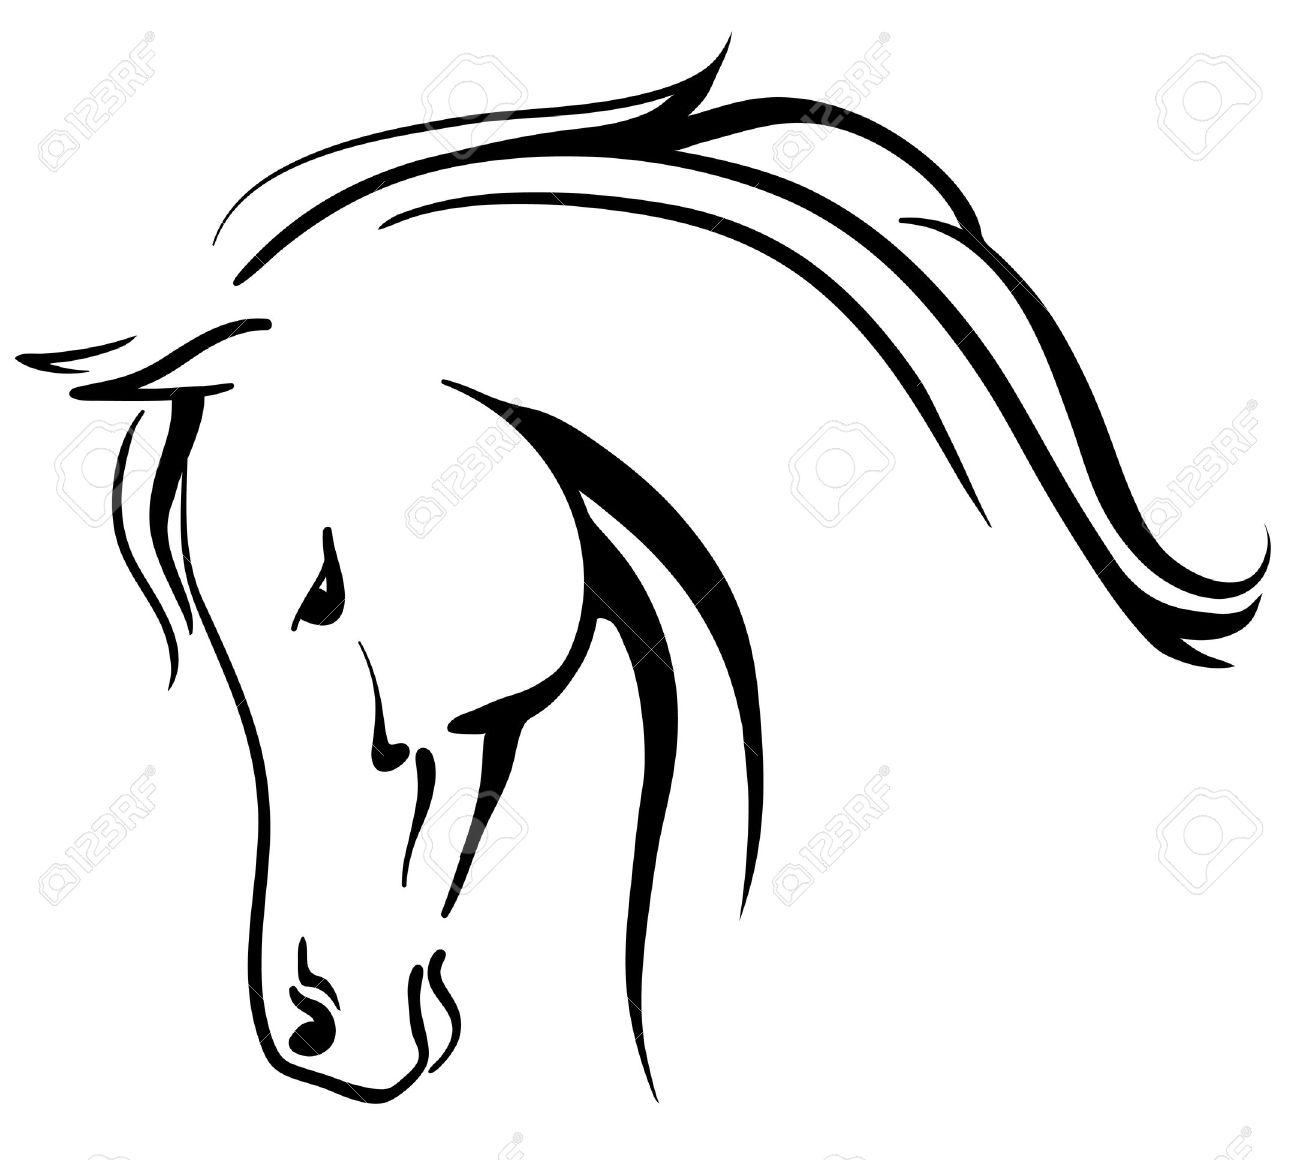 clip art arabian horse stylised head royalty free cliparts vectors rh 123rf com vector art horse head horse head vector png